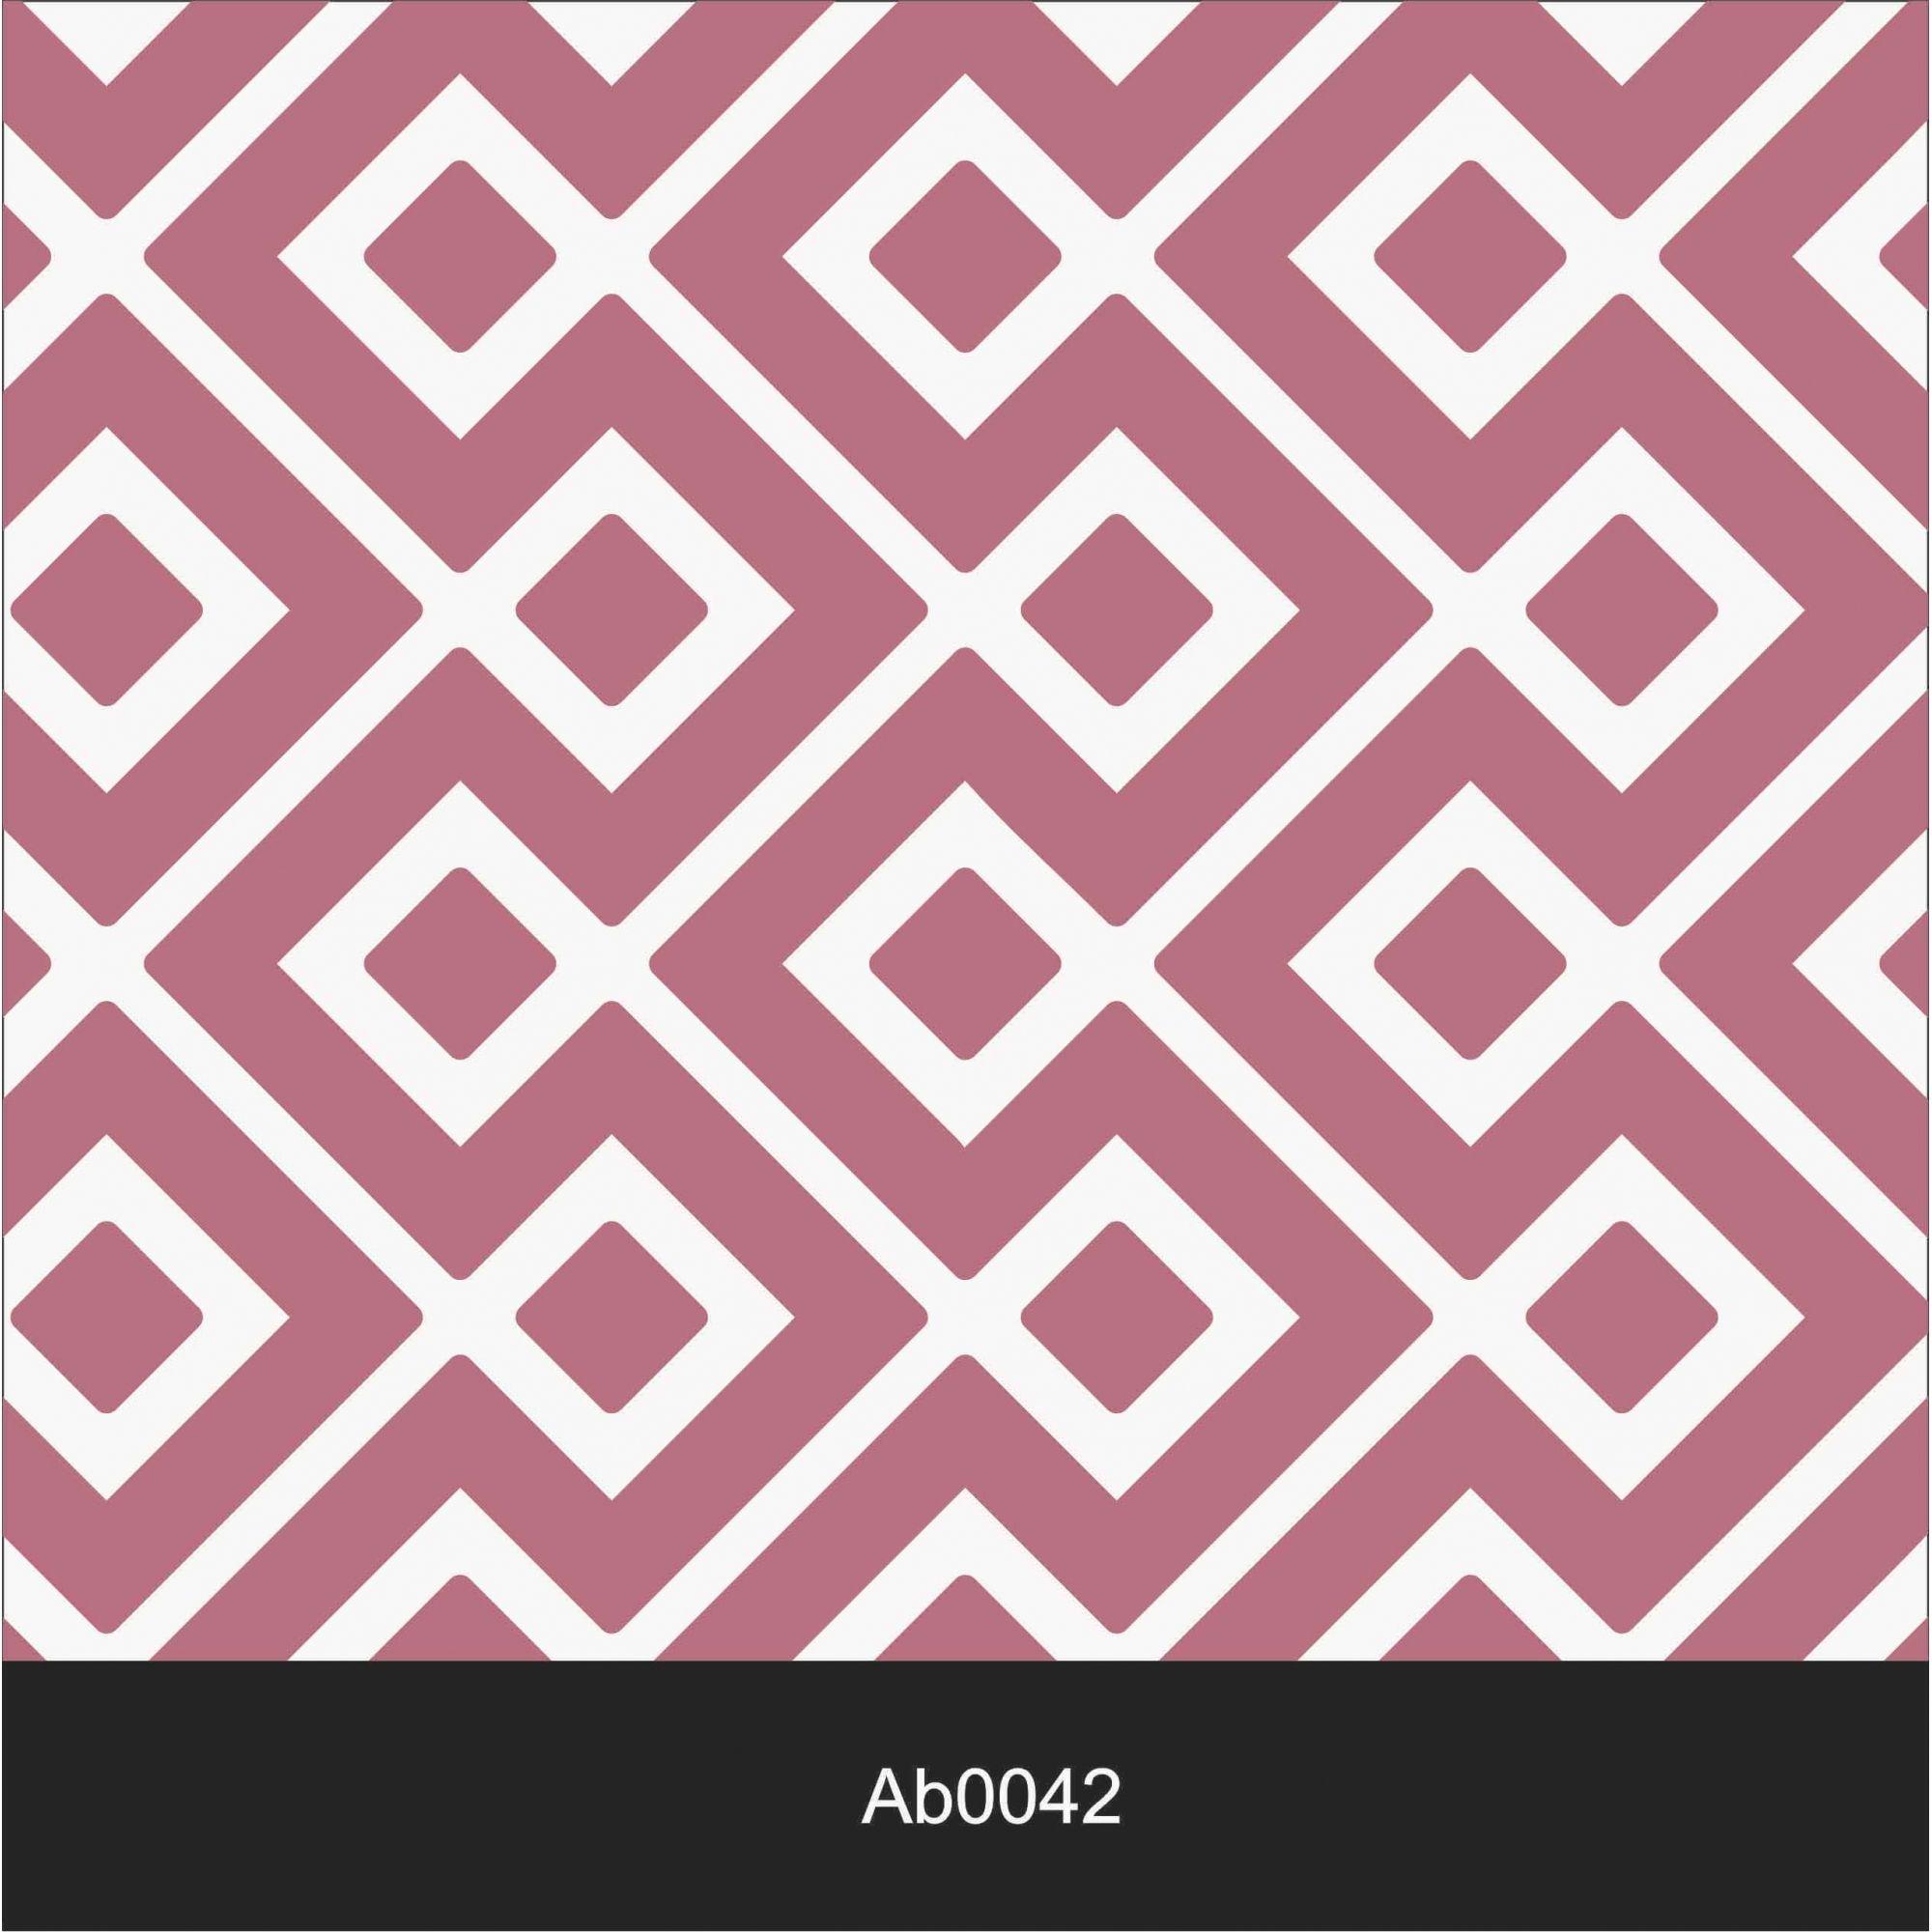 Papel de Parede Auto Adesivo Lavável Abstrato Geométrico Colorido AB0042  - Final Decor